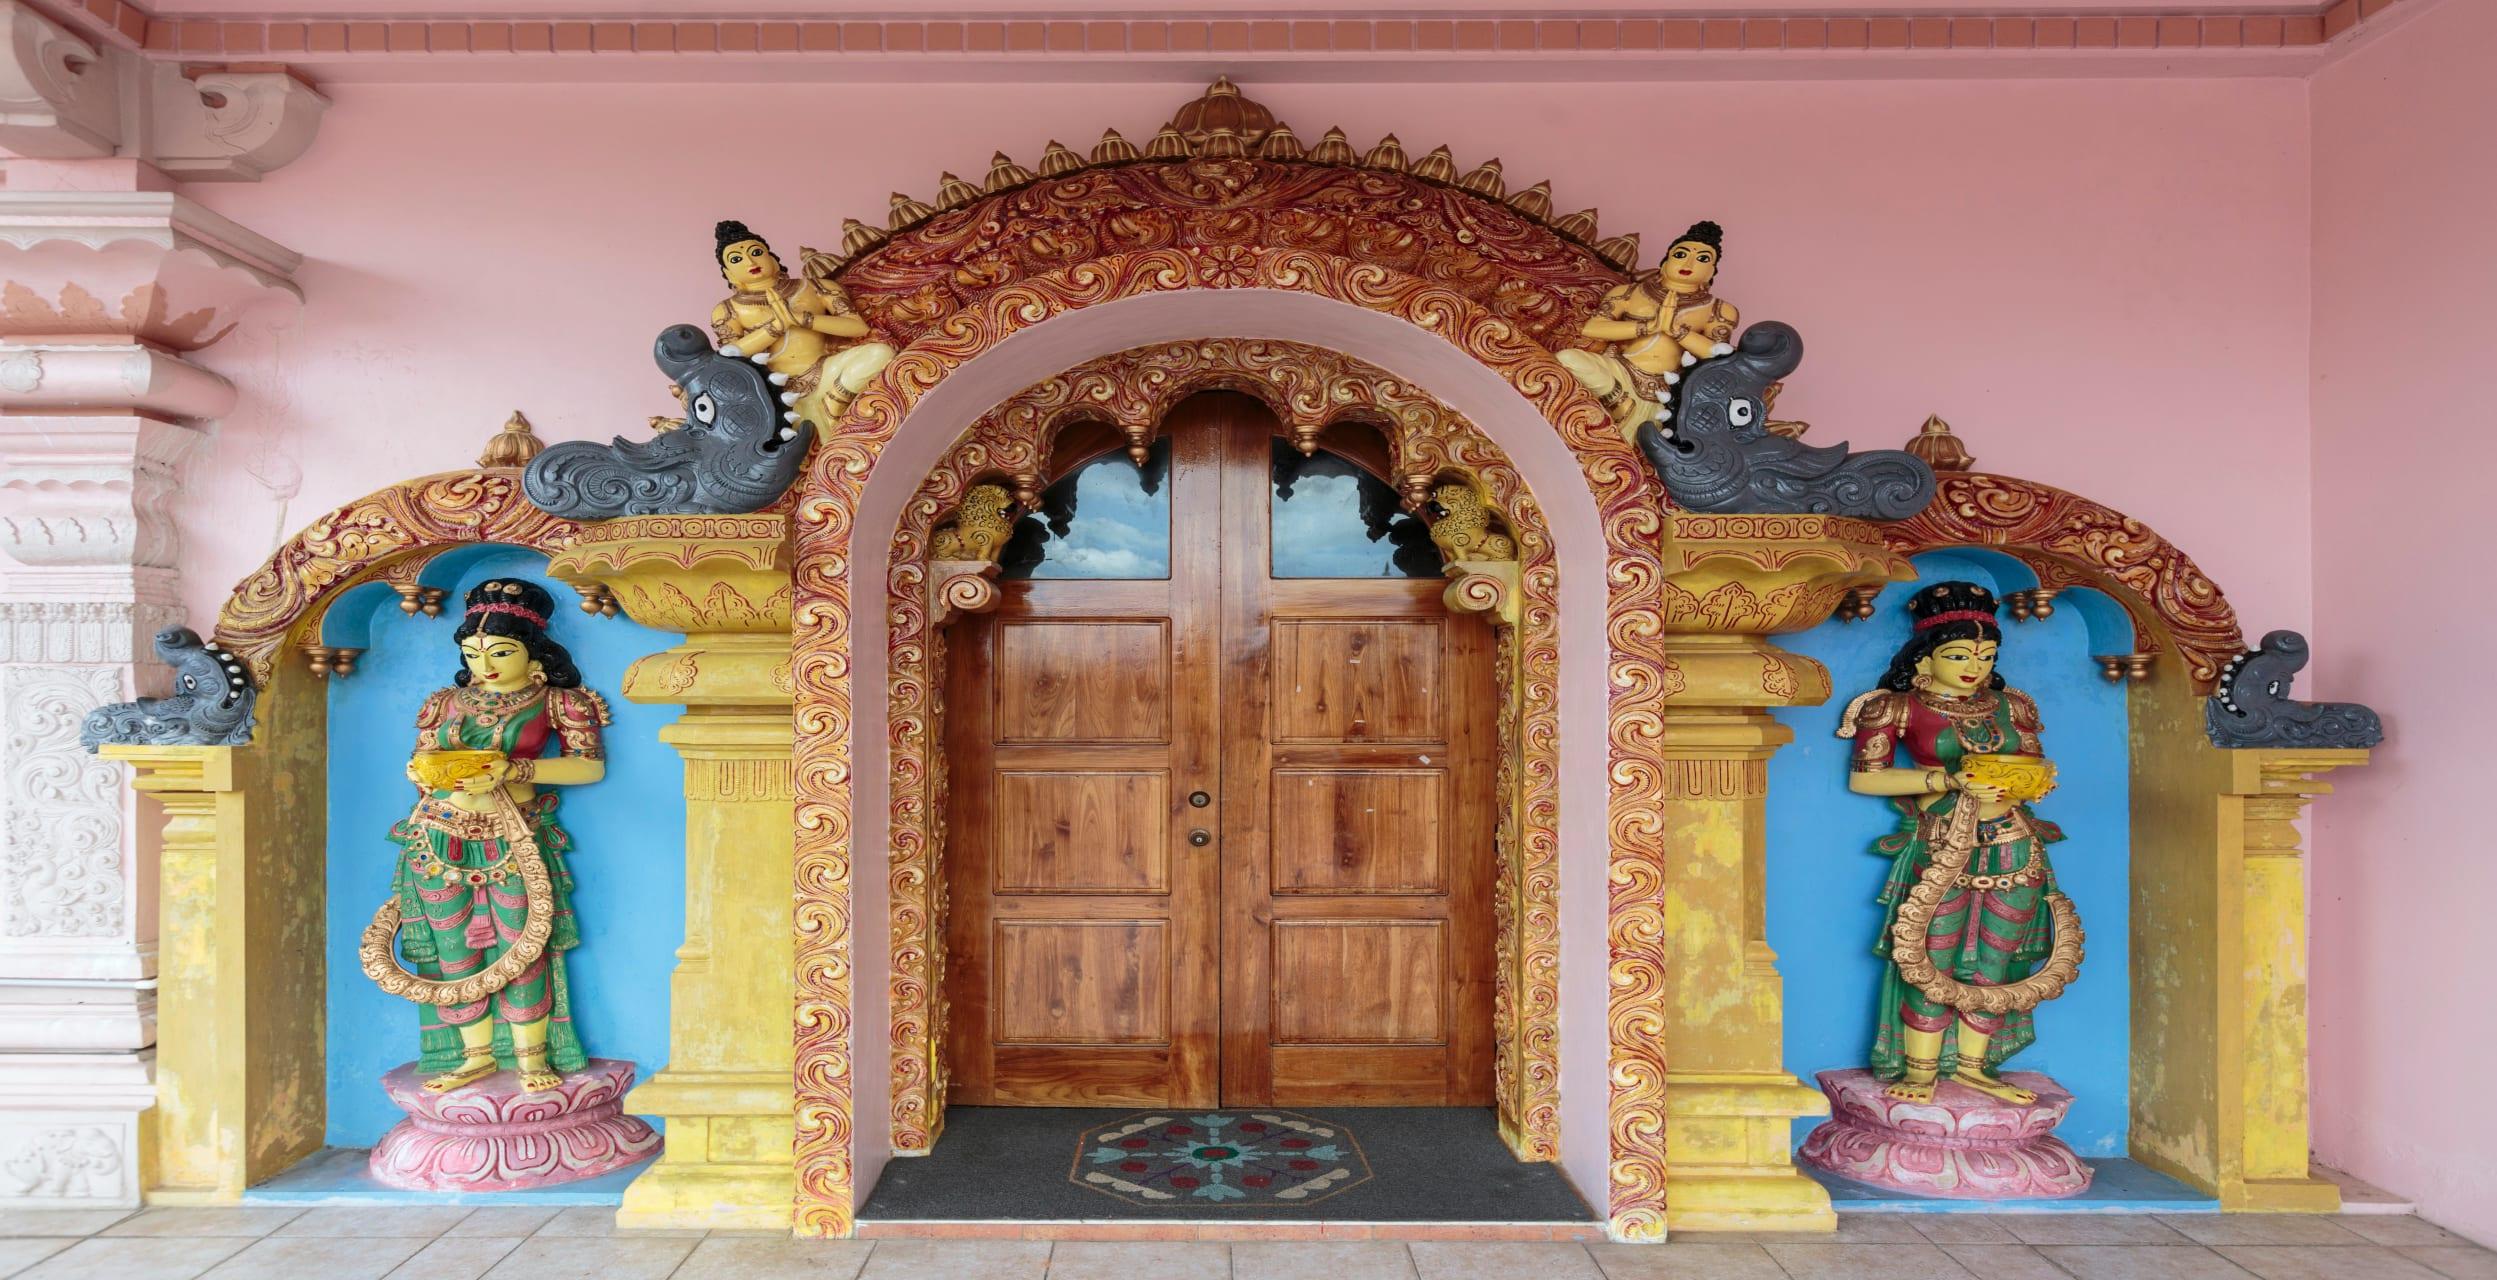 Port of Spain - An Evening Connection with the Dattatreya Hanuman Temple